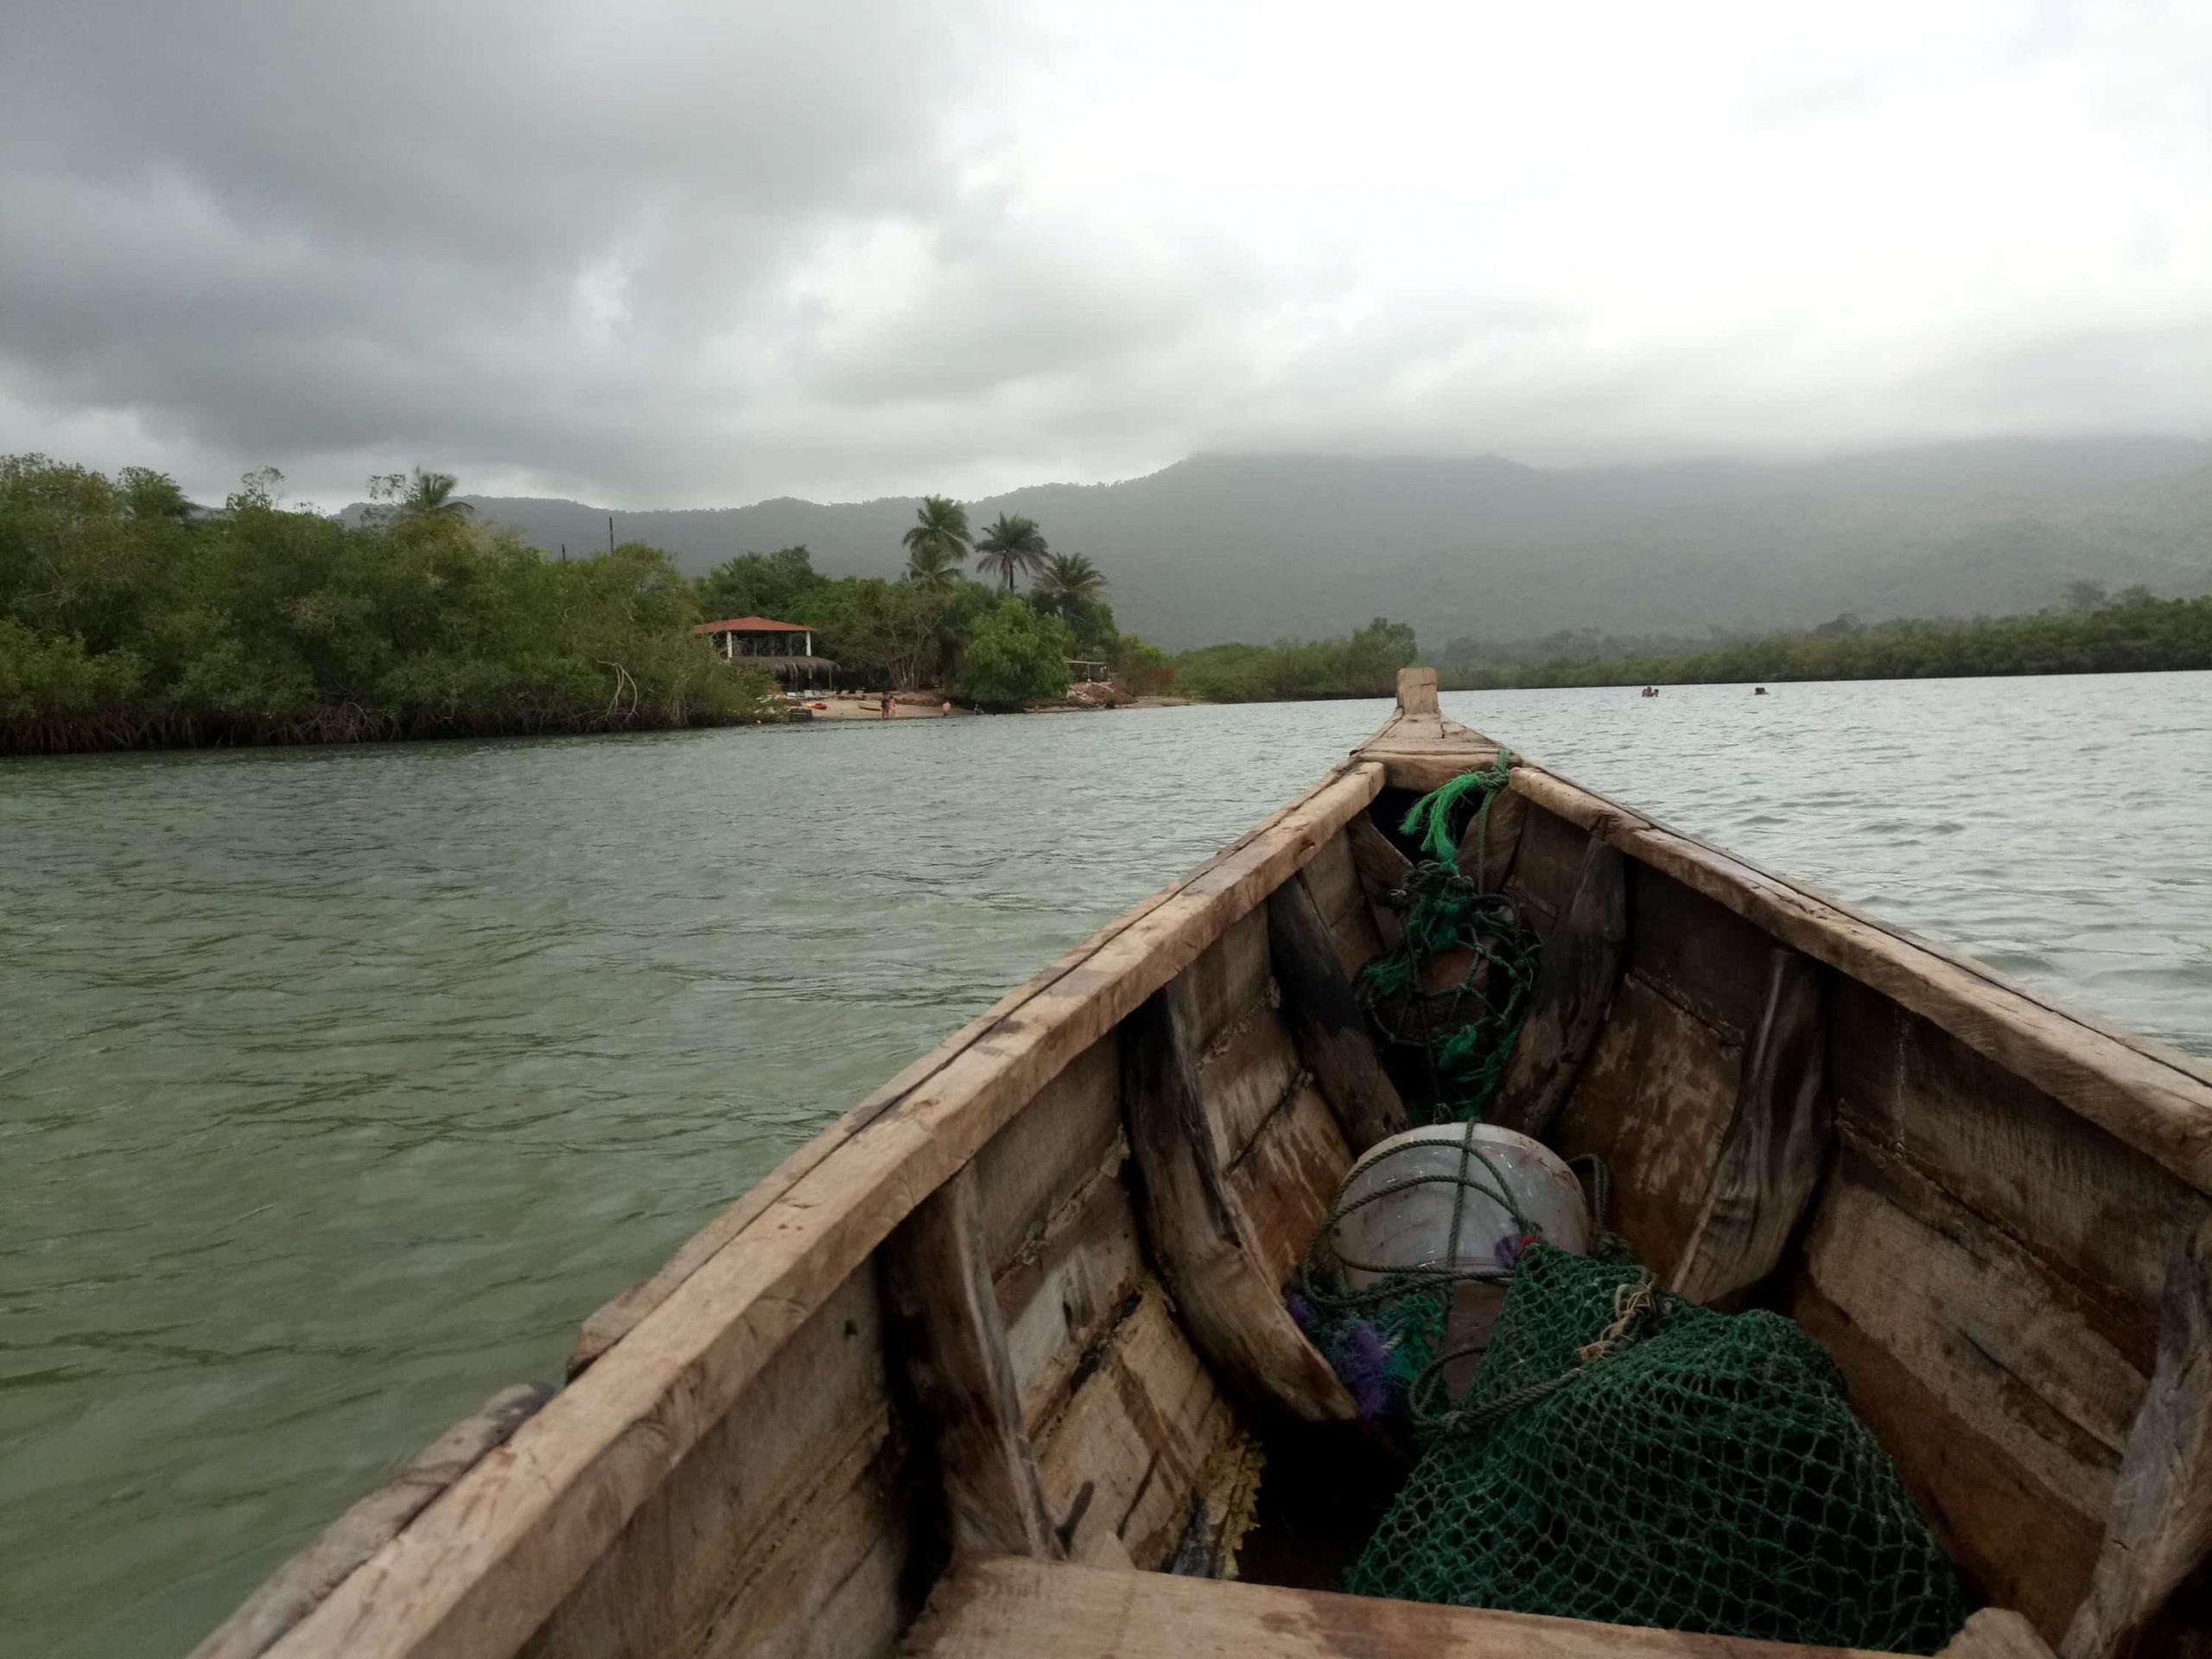 Sierra Leone River No 2 boat crossing